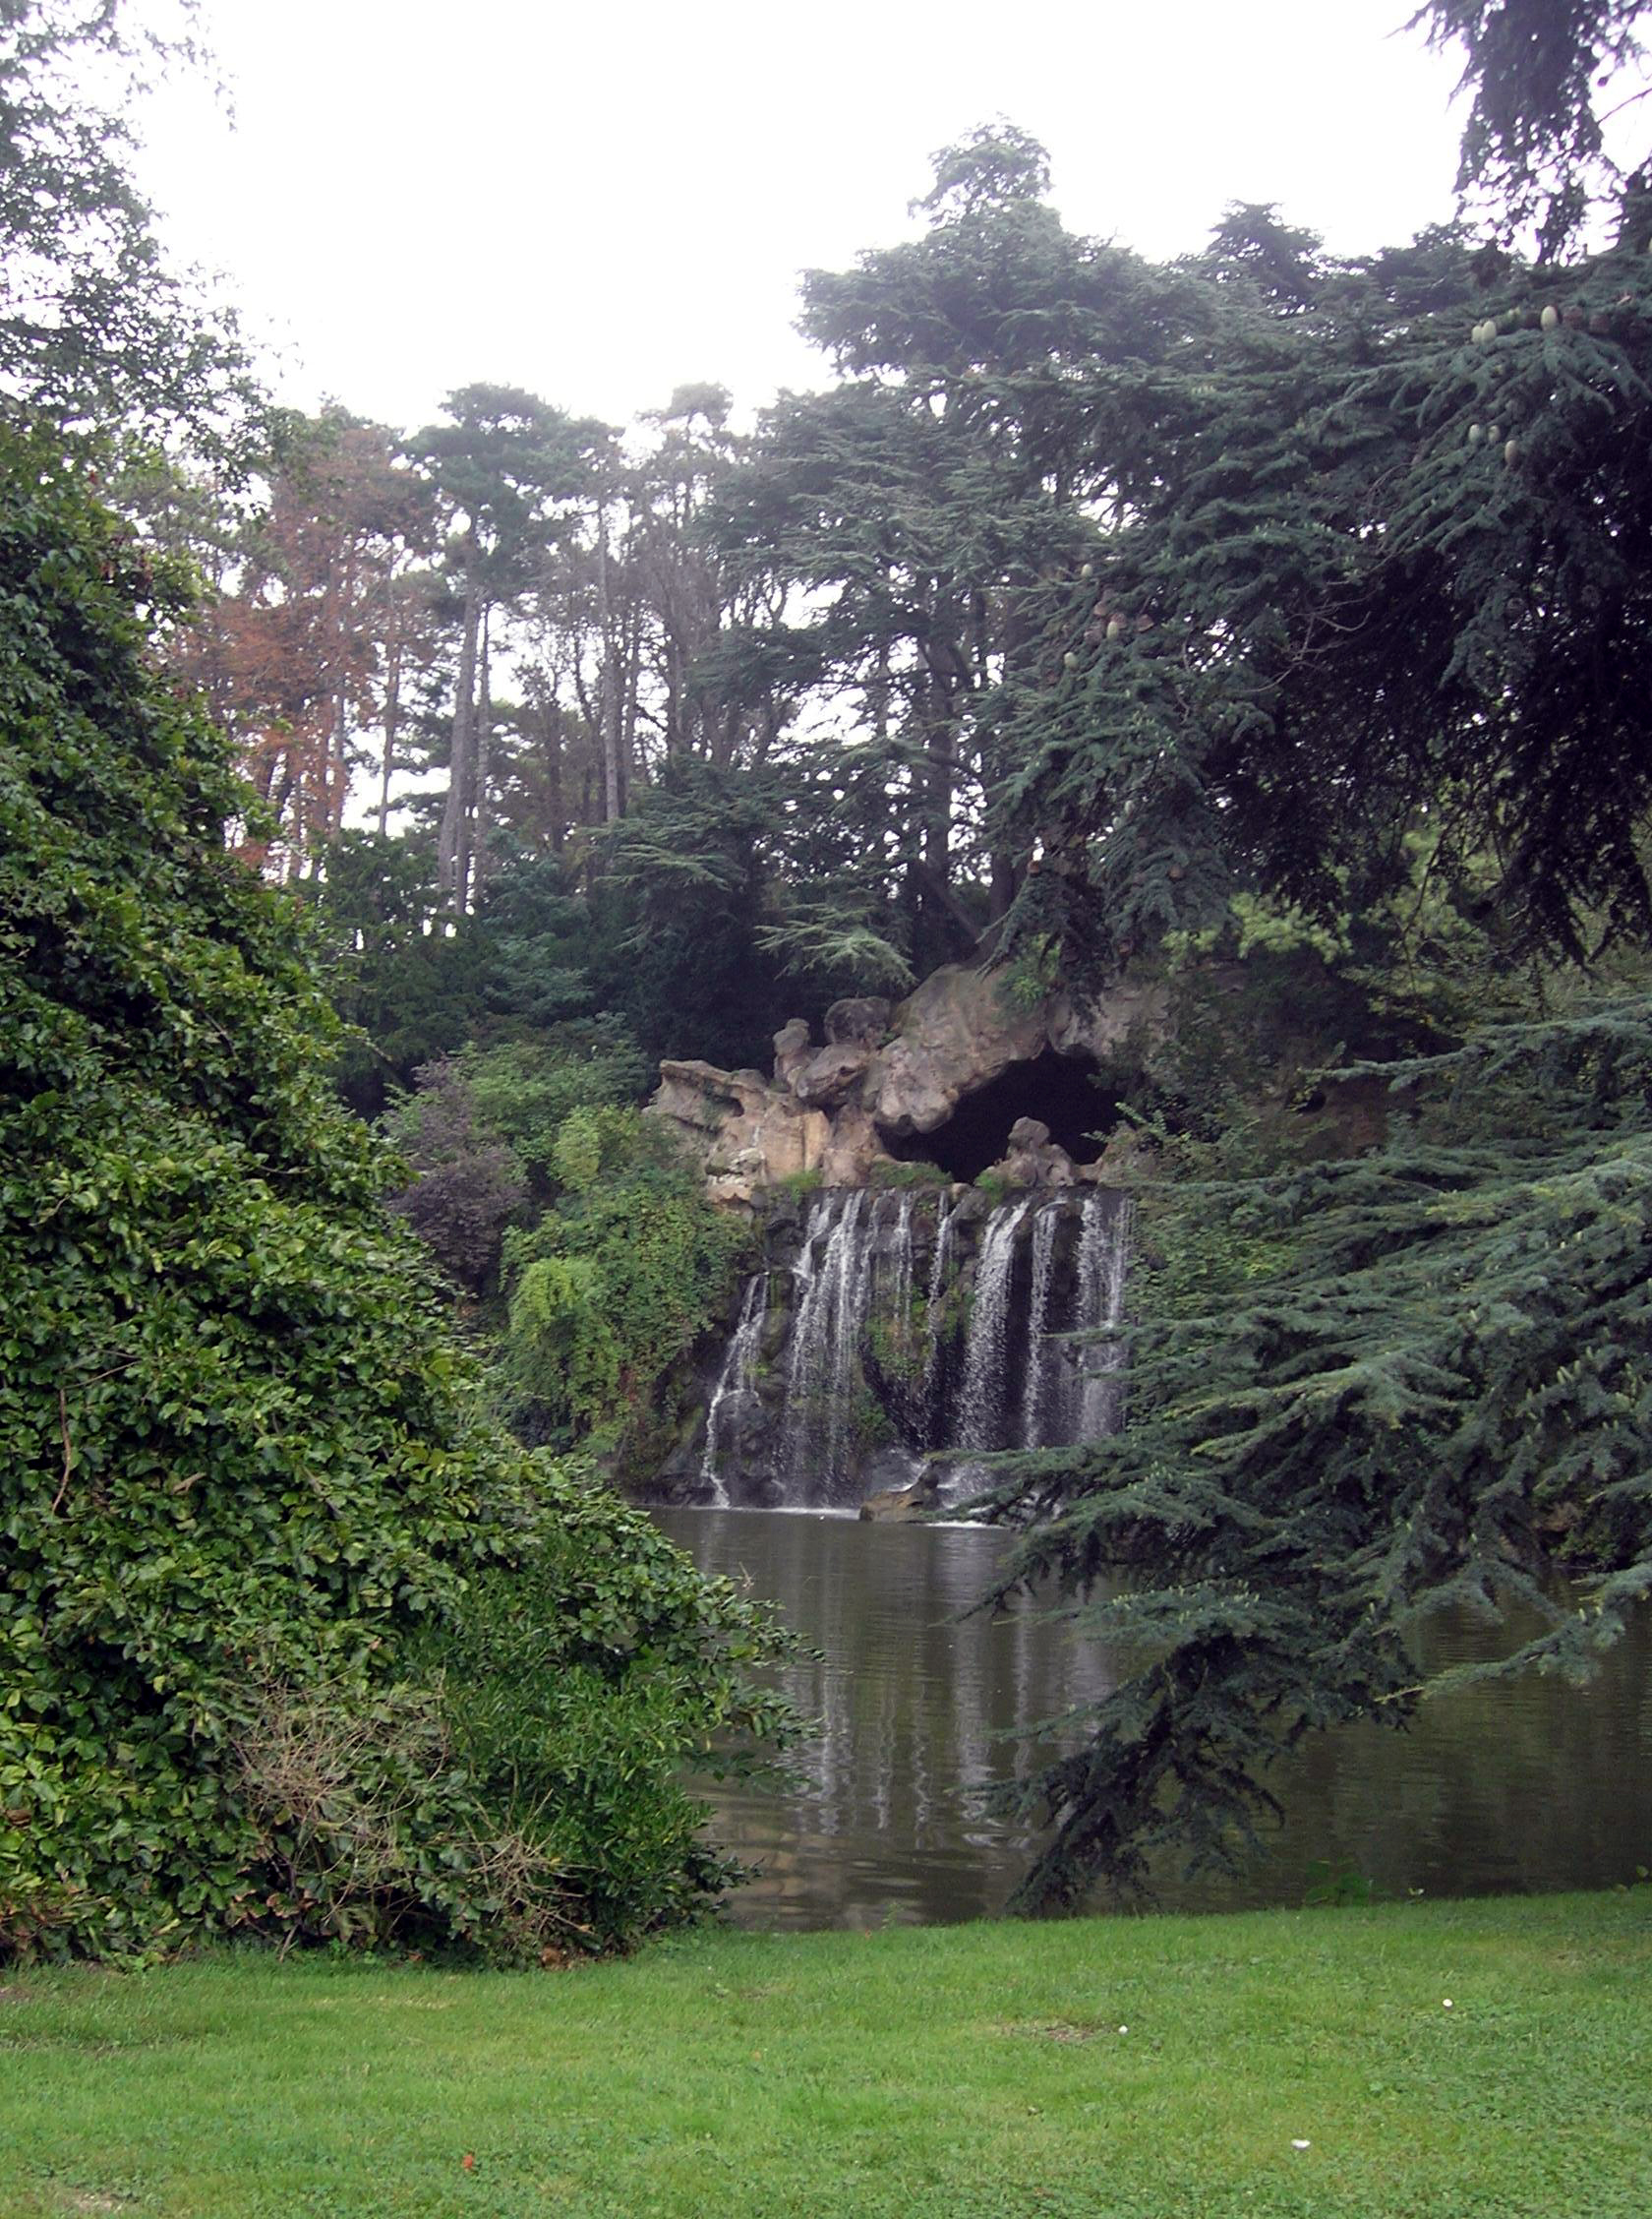 Image Bois De Boulogne : File:Grande cascade bois de Boulogne.JPG